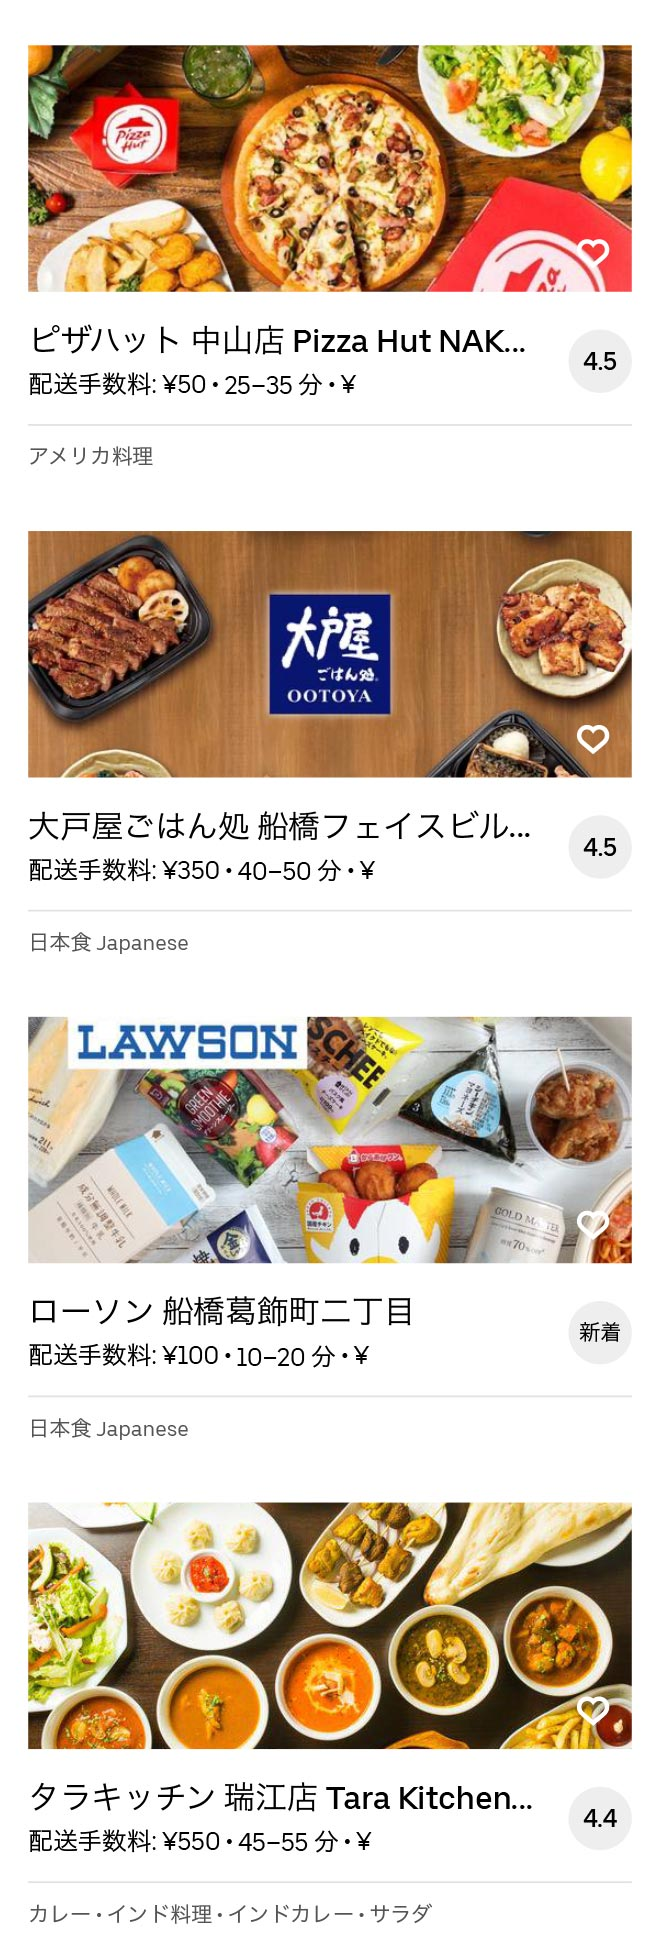 Nishi funabashi menu 2008 07